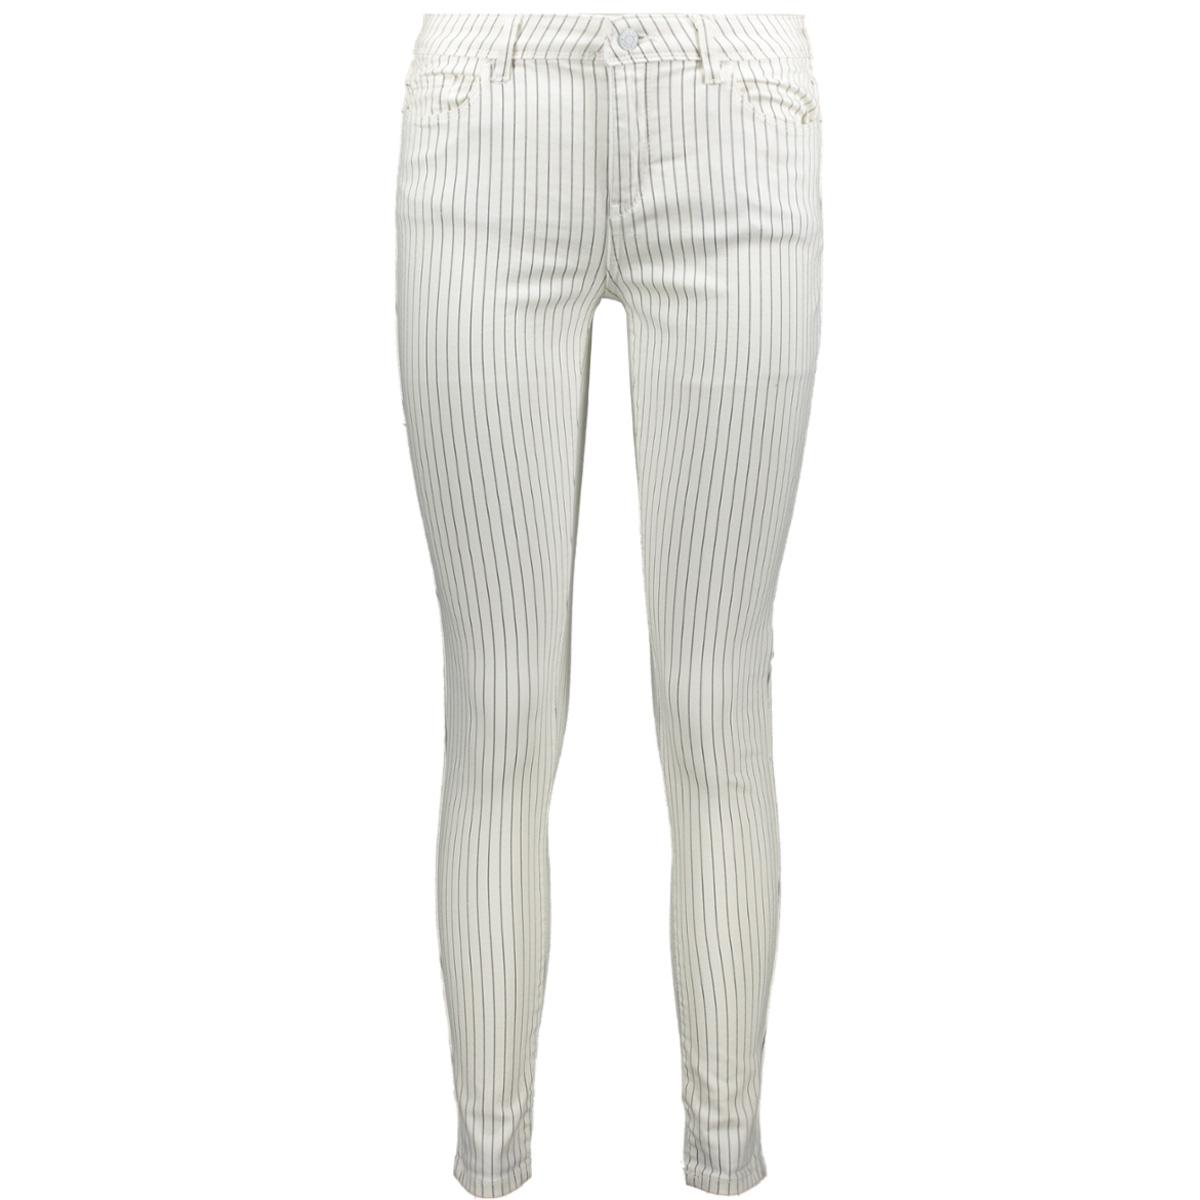 jeans met streeppatroon 079ee1b011 esprit jeans e100